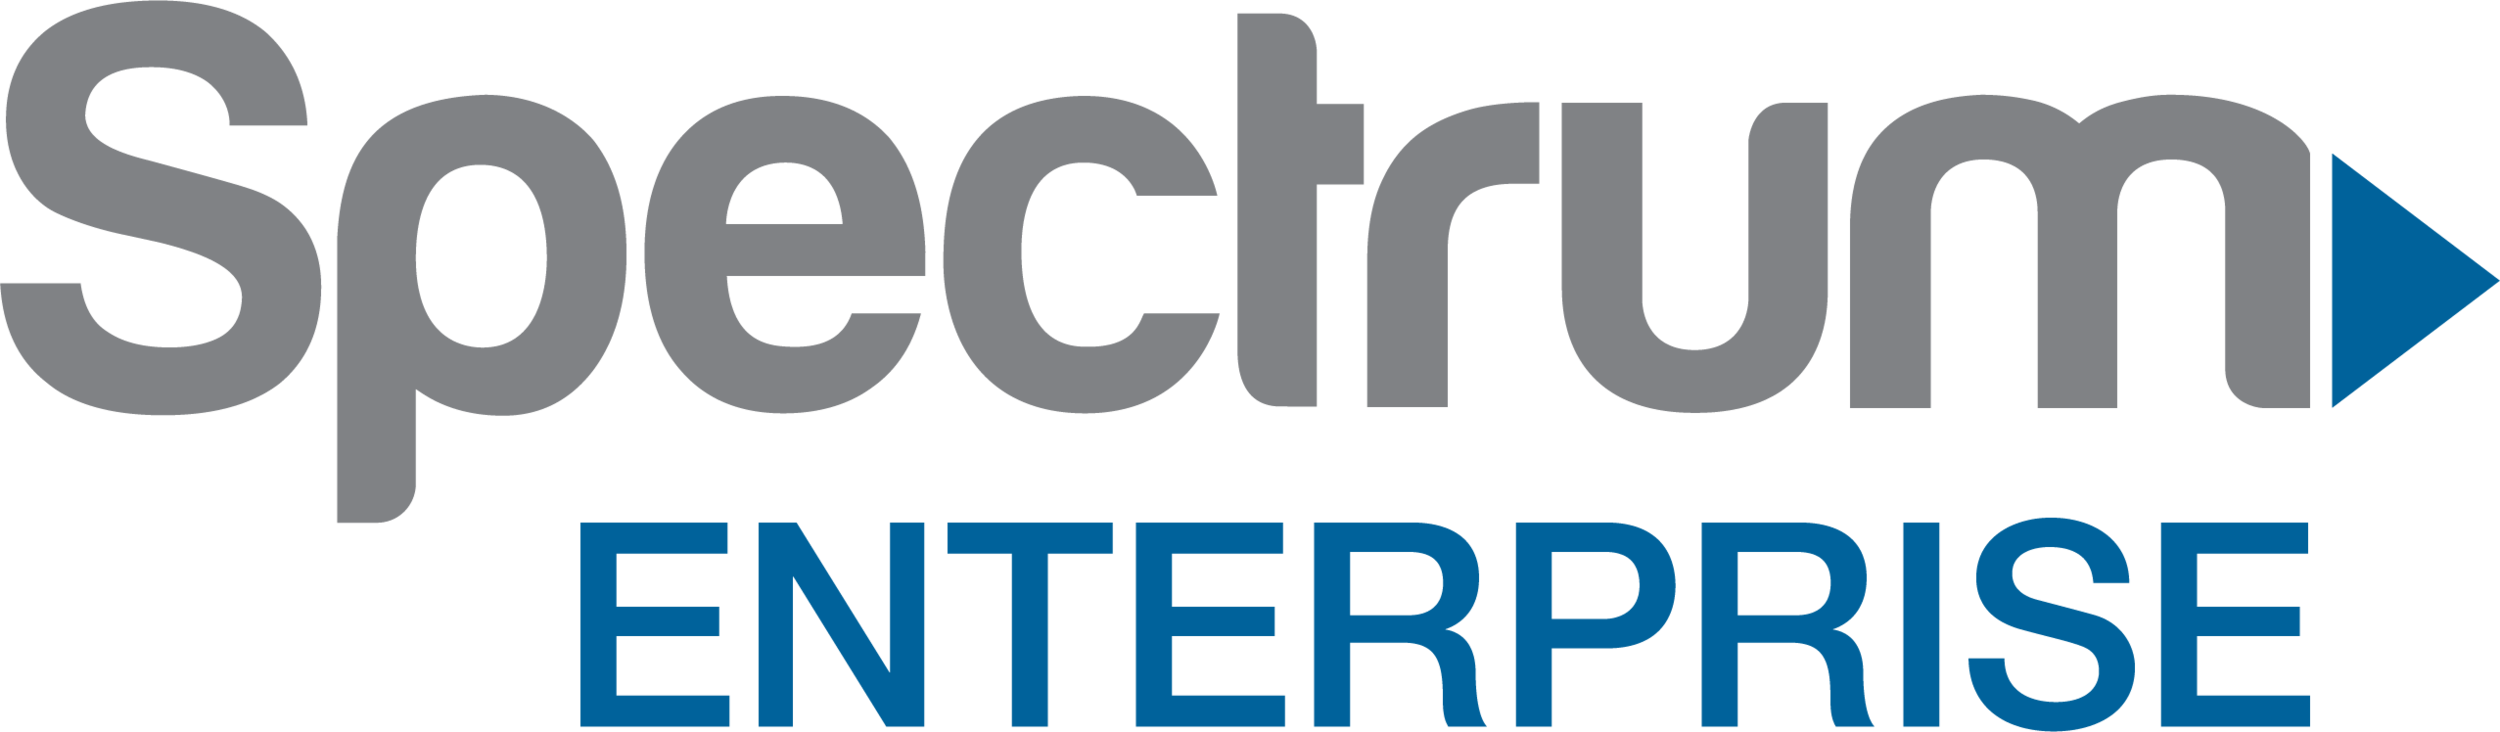 Spectrum_Enterprise_Logo_RGB.png